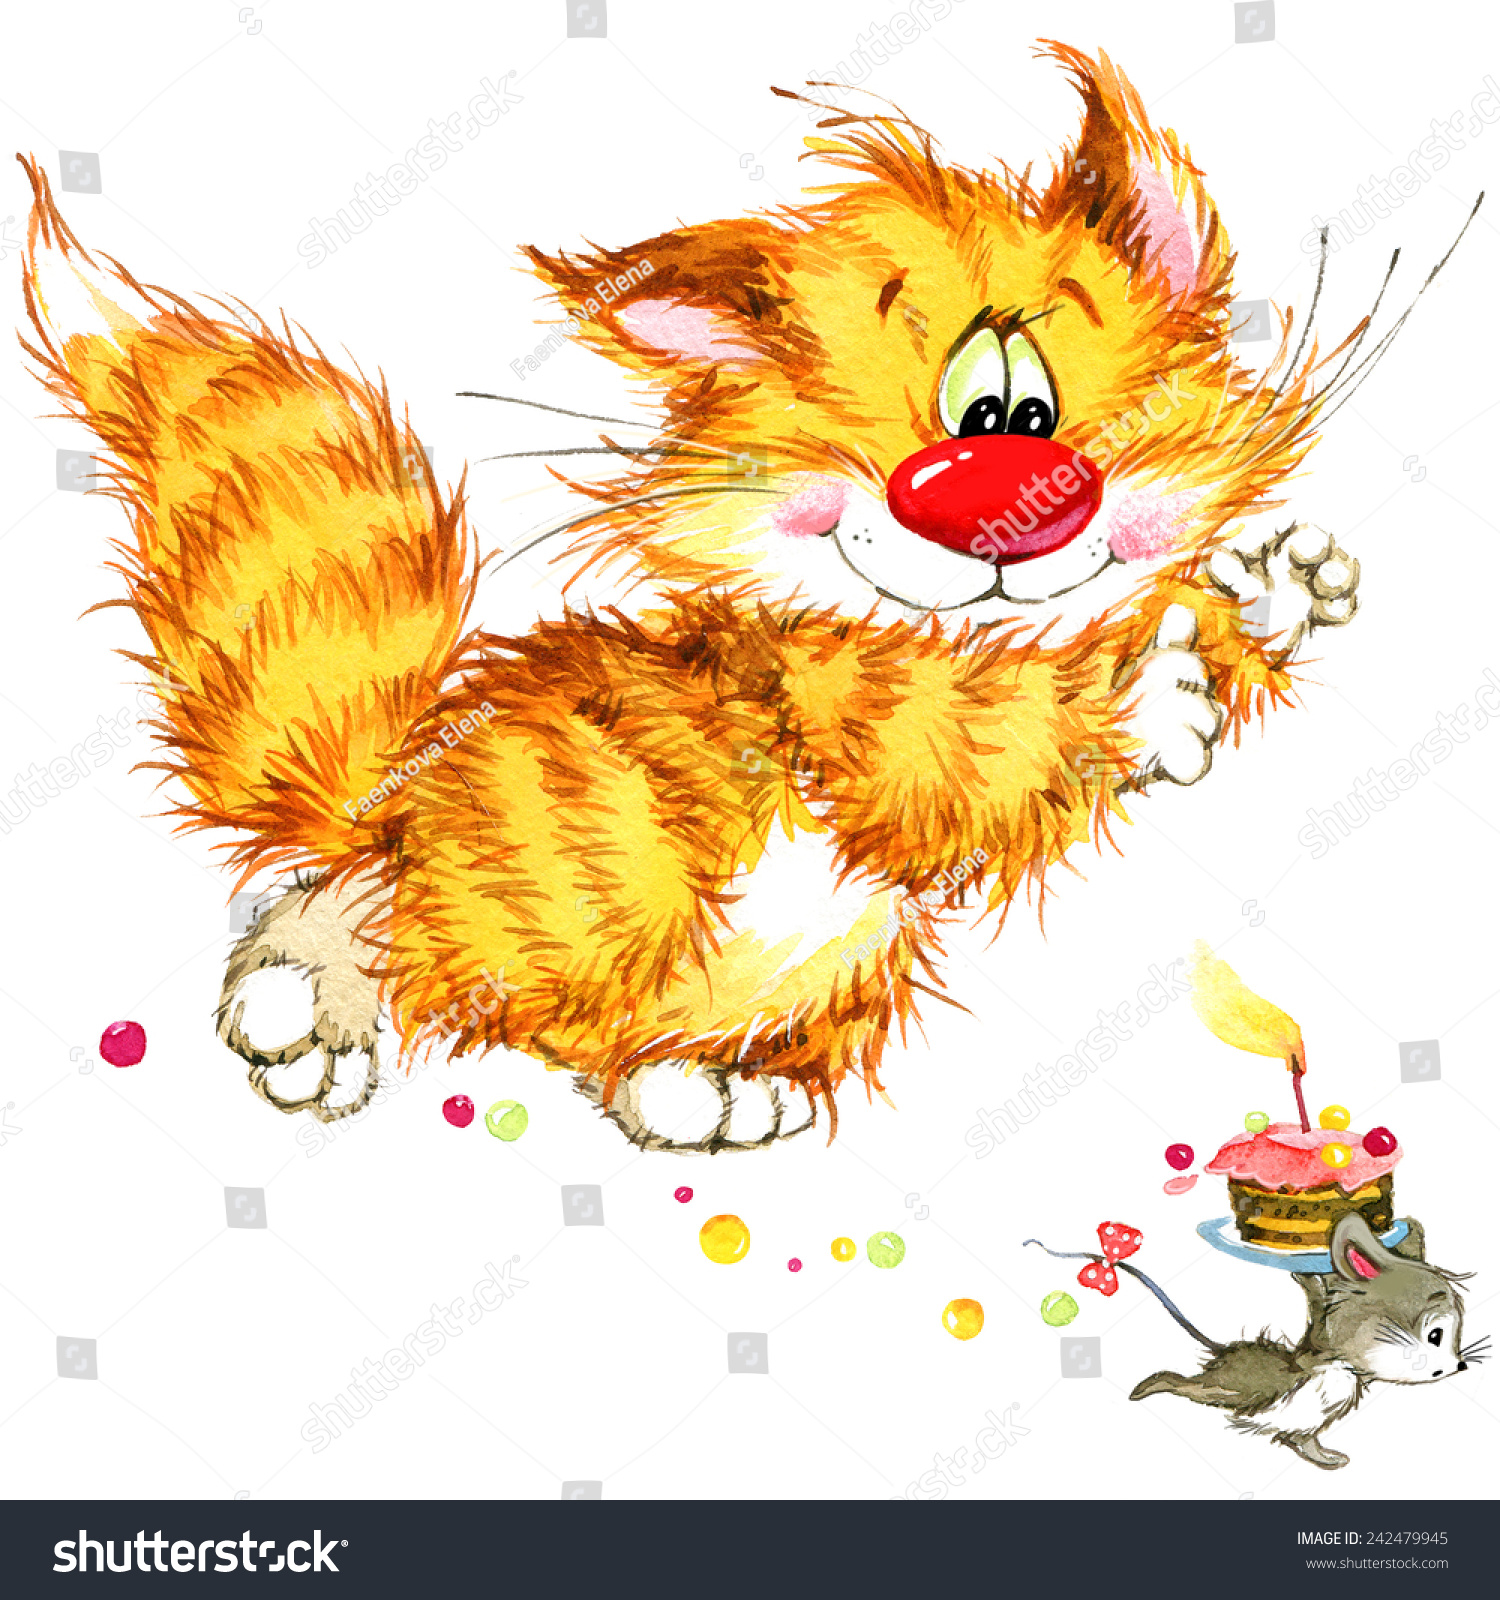 Cartoon Funny Cat Element Holiday Greetings Stock Illustration ...